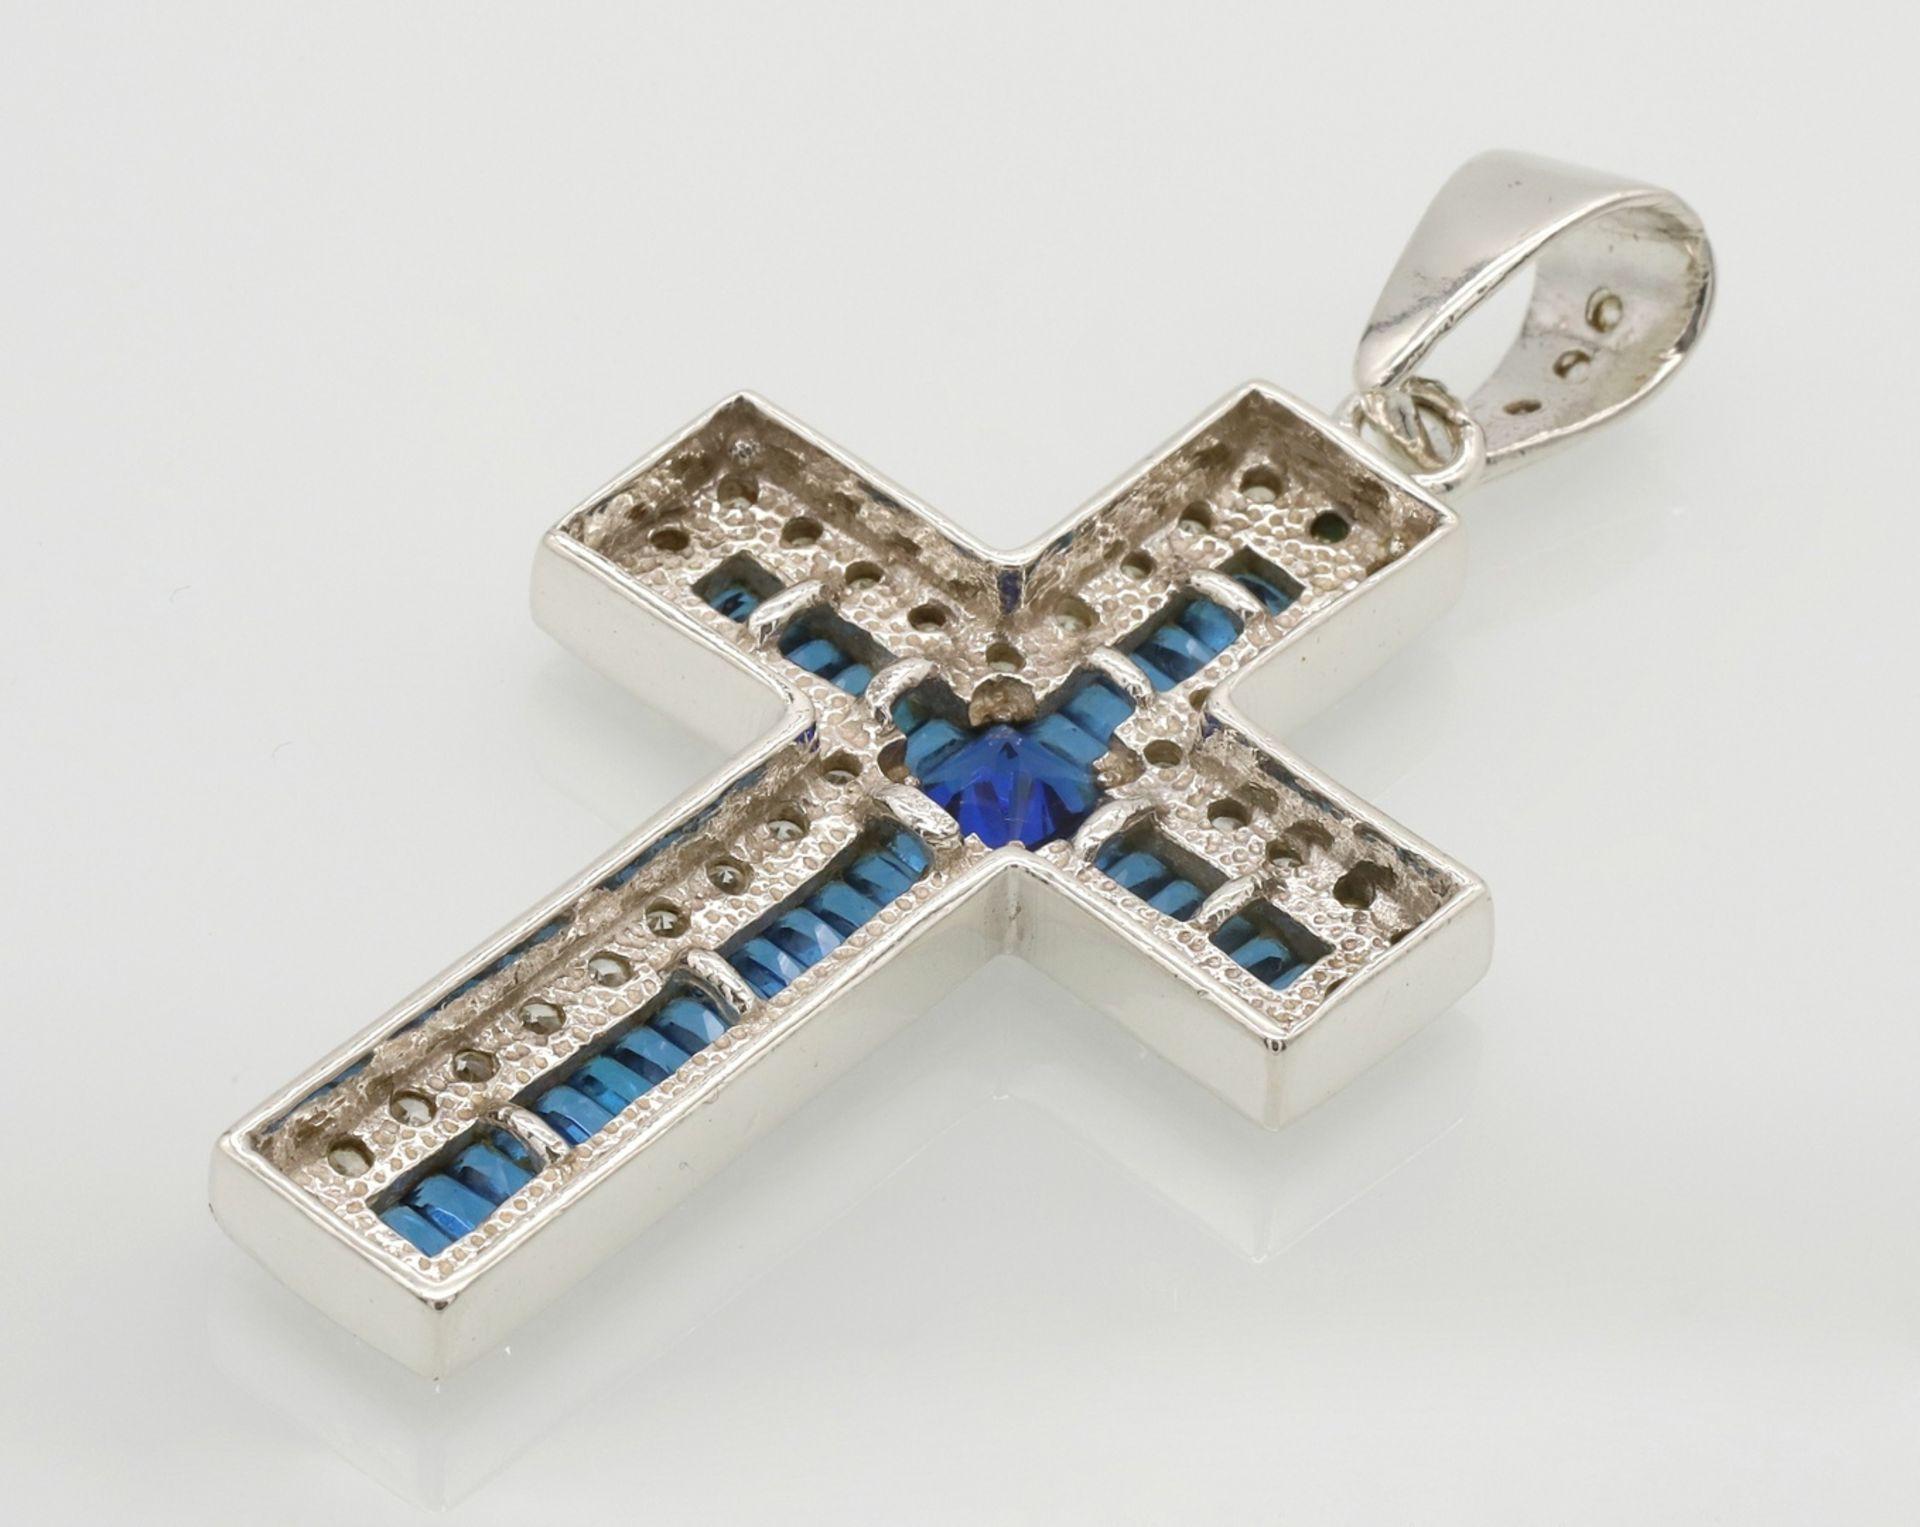 Opulenter Kreuz-Anhänger aus Silber - Bild 2 aus 3